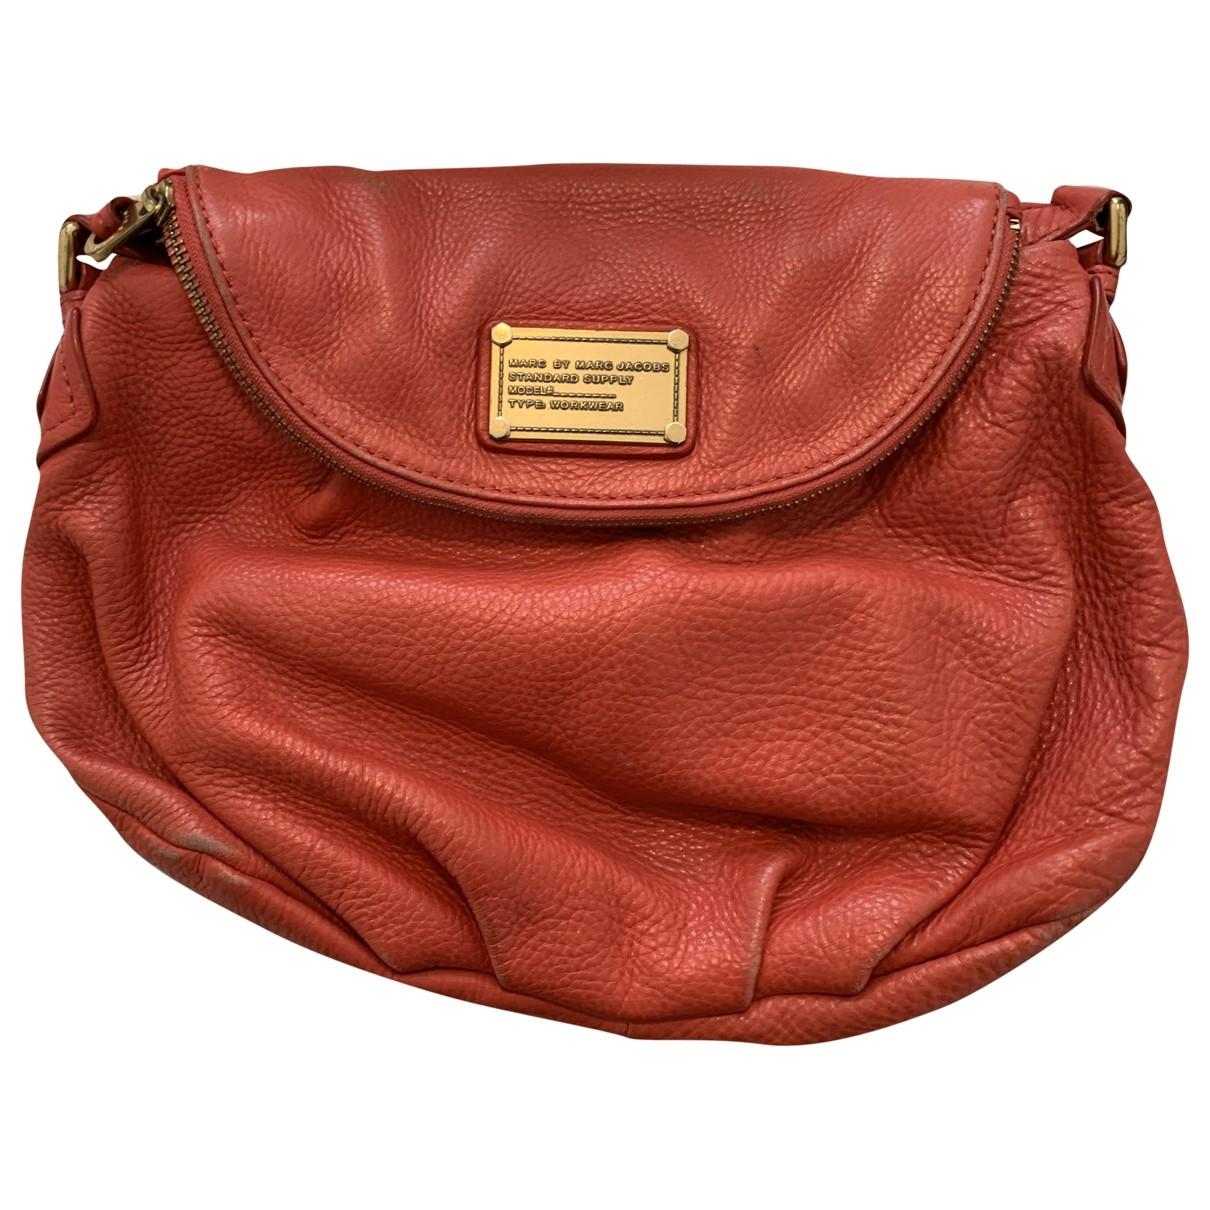 Marc By Marc Jacobs \N Orange Leather handbag for Women \N